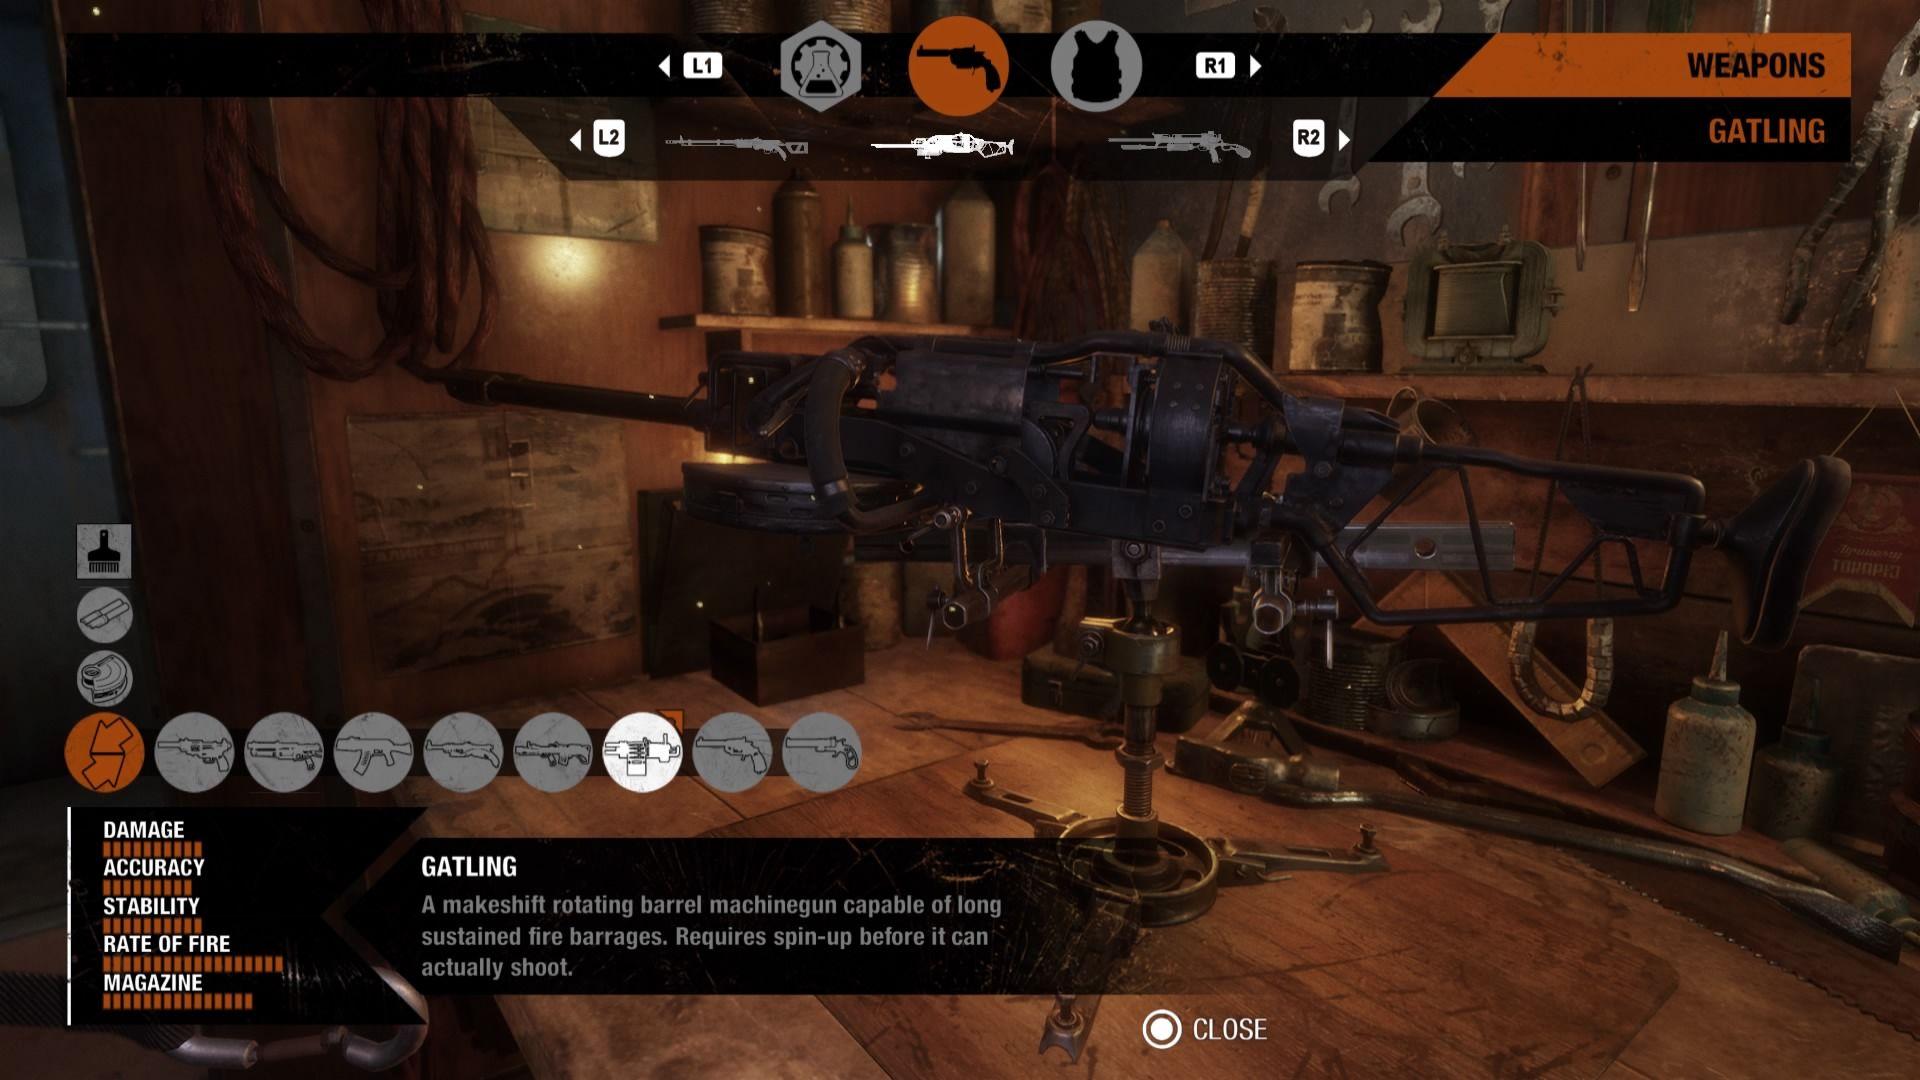 metro-exodus-weapons-list-gatling-customization